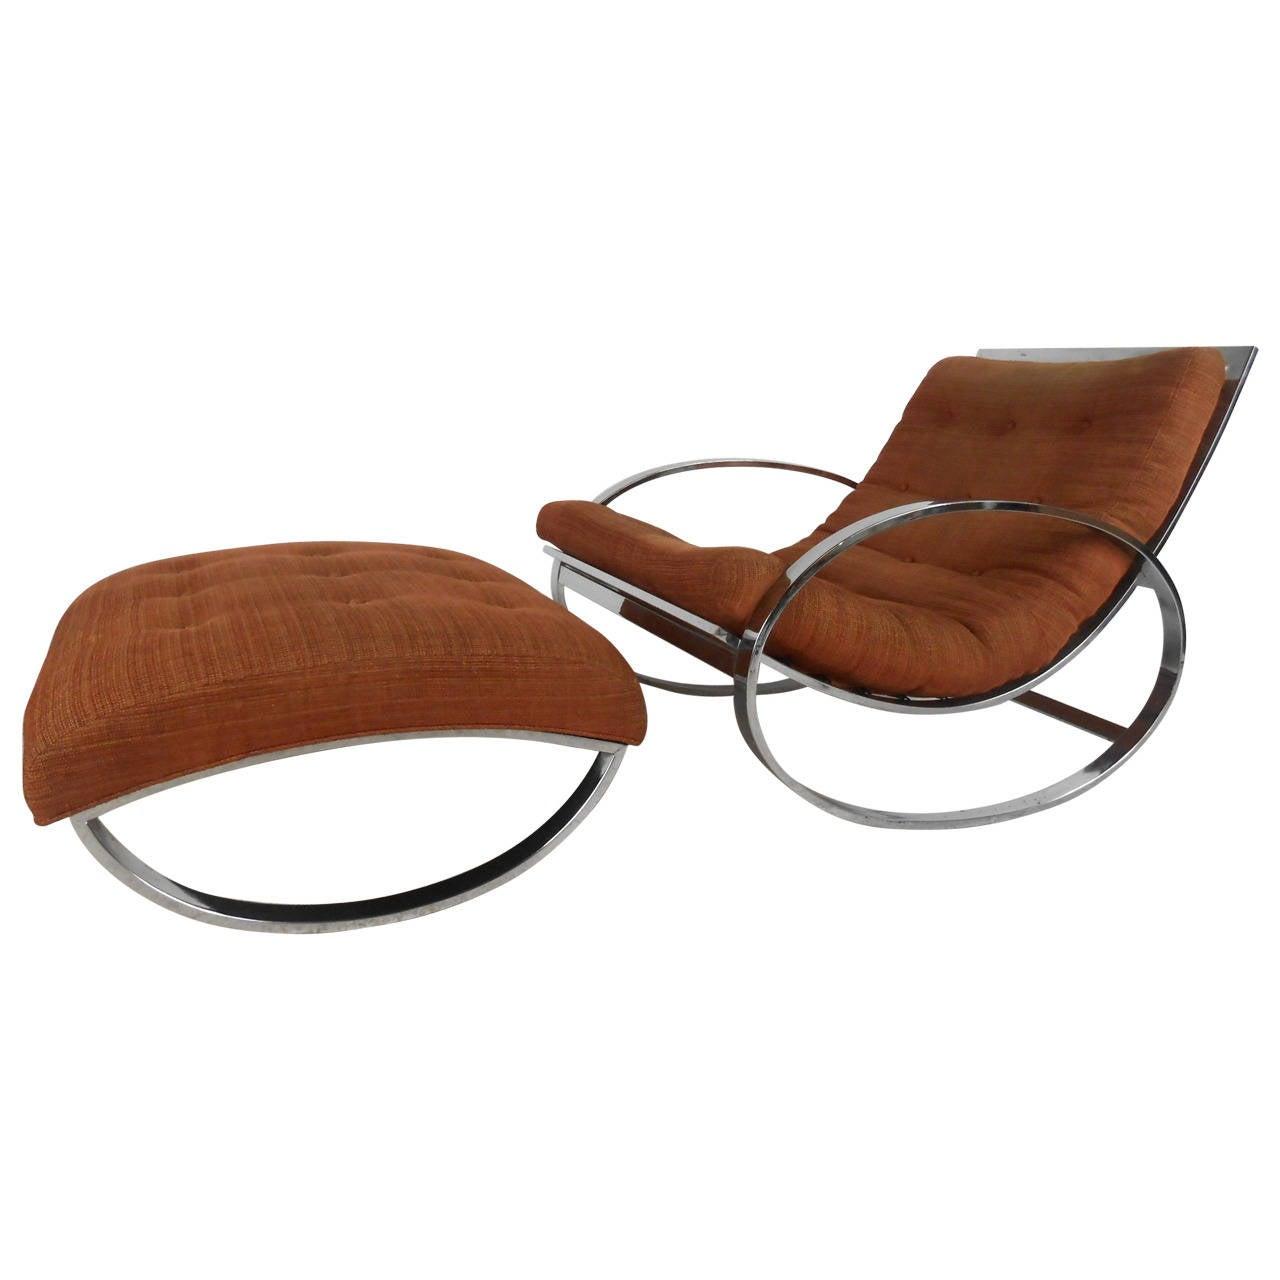 Ashley Furniture In Linden Nj: Milo Baughman Style Mid-Century Modern Renato Zevi Ellipse